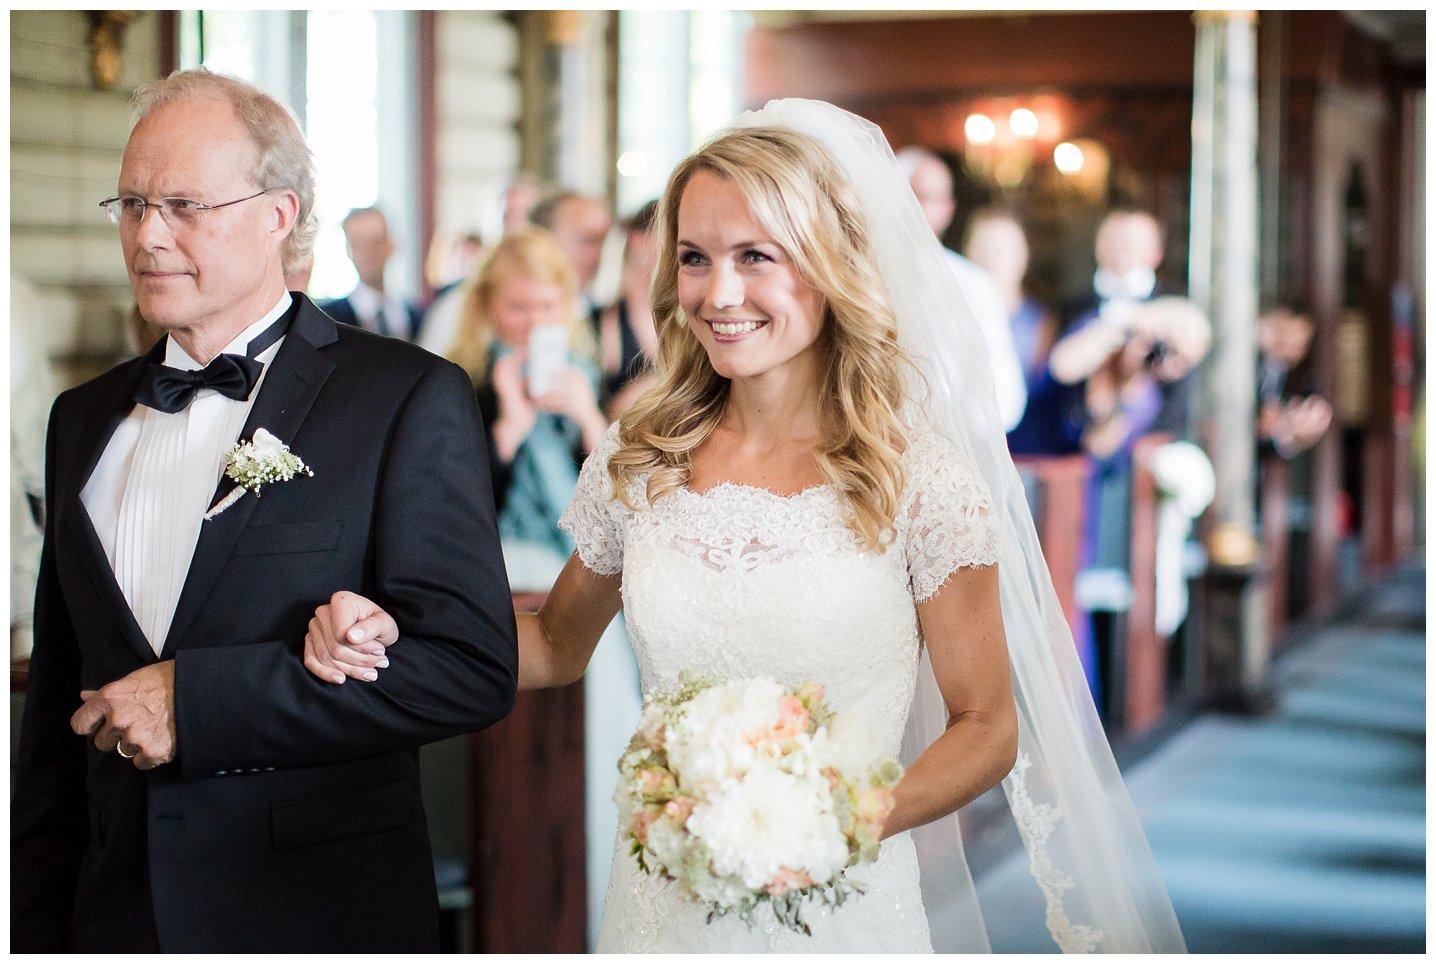 Fotograf-Eline-Jacobine-Bryllup-Villa-Malla-Camilla-og-Alexander_0061